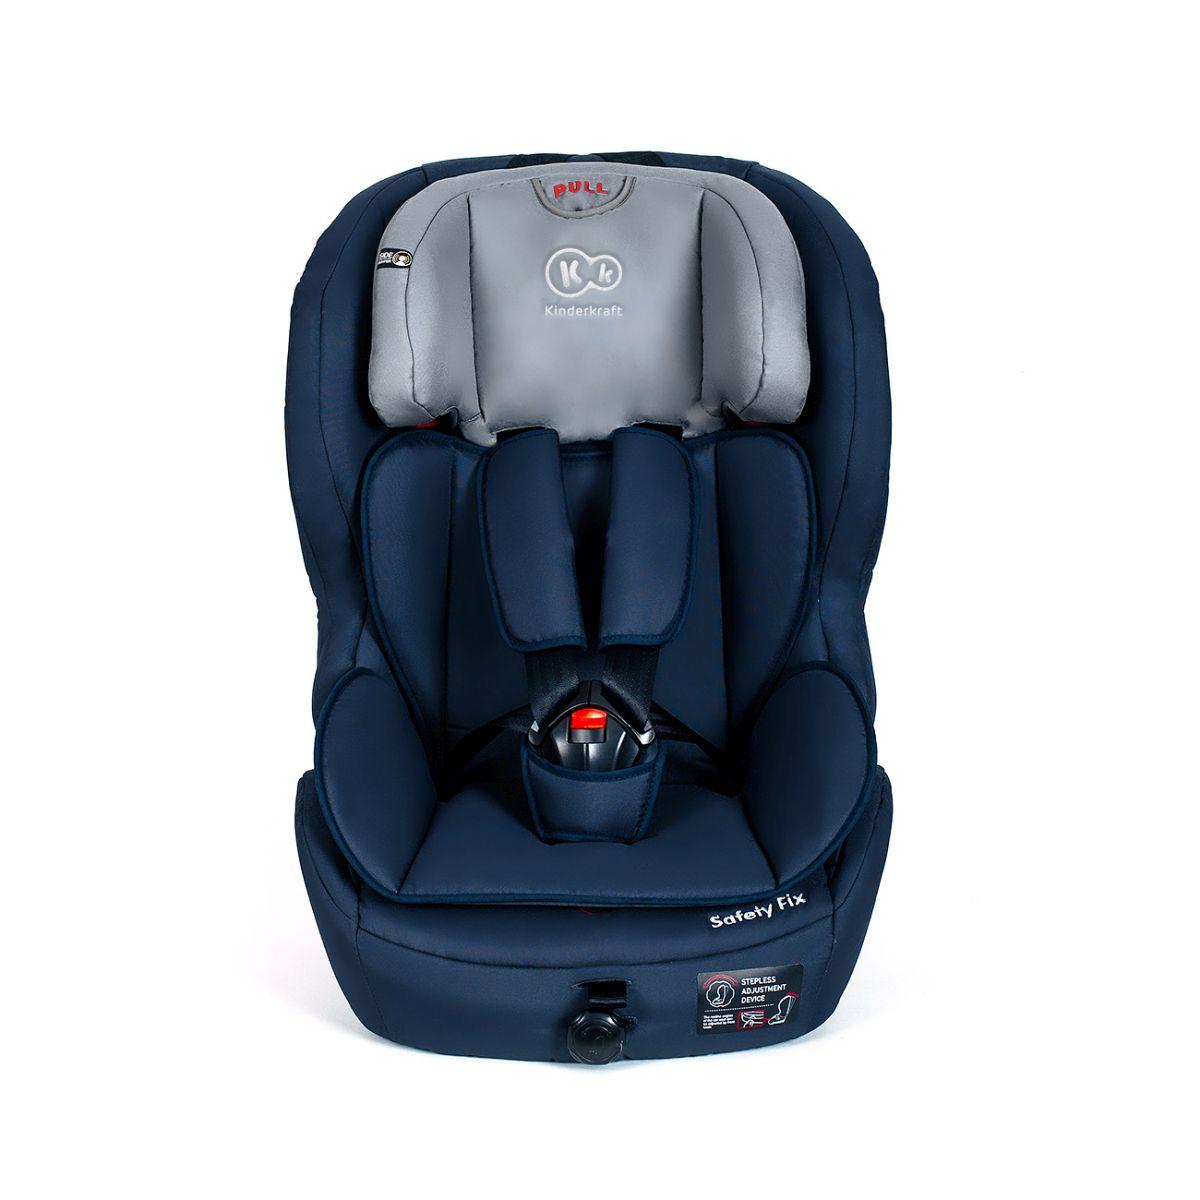 kinderkraft safetyfix bleu fonc isofix si ge voiture pour b b 9 de 36 kg. Black Bedroom Furniture Sets. Home Design Ideas